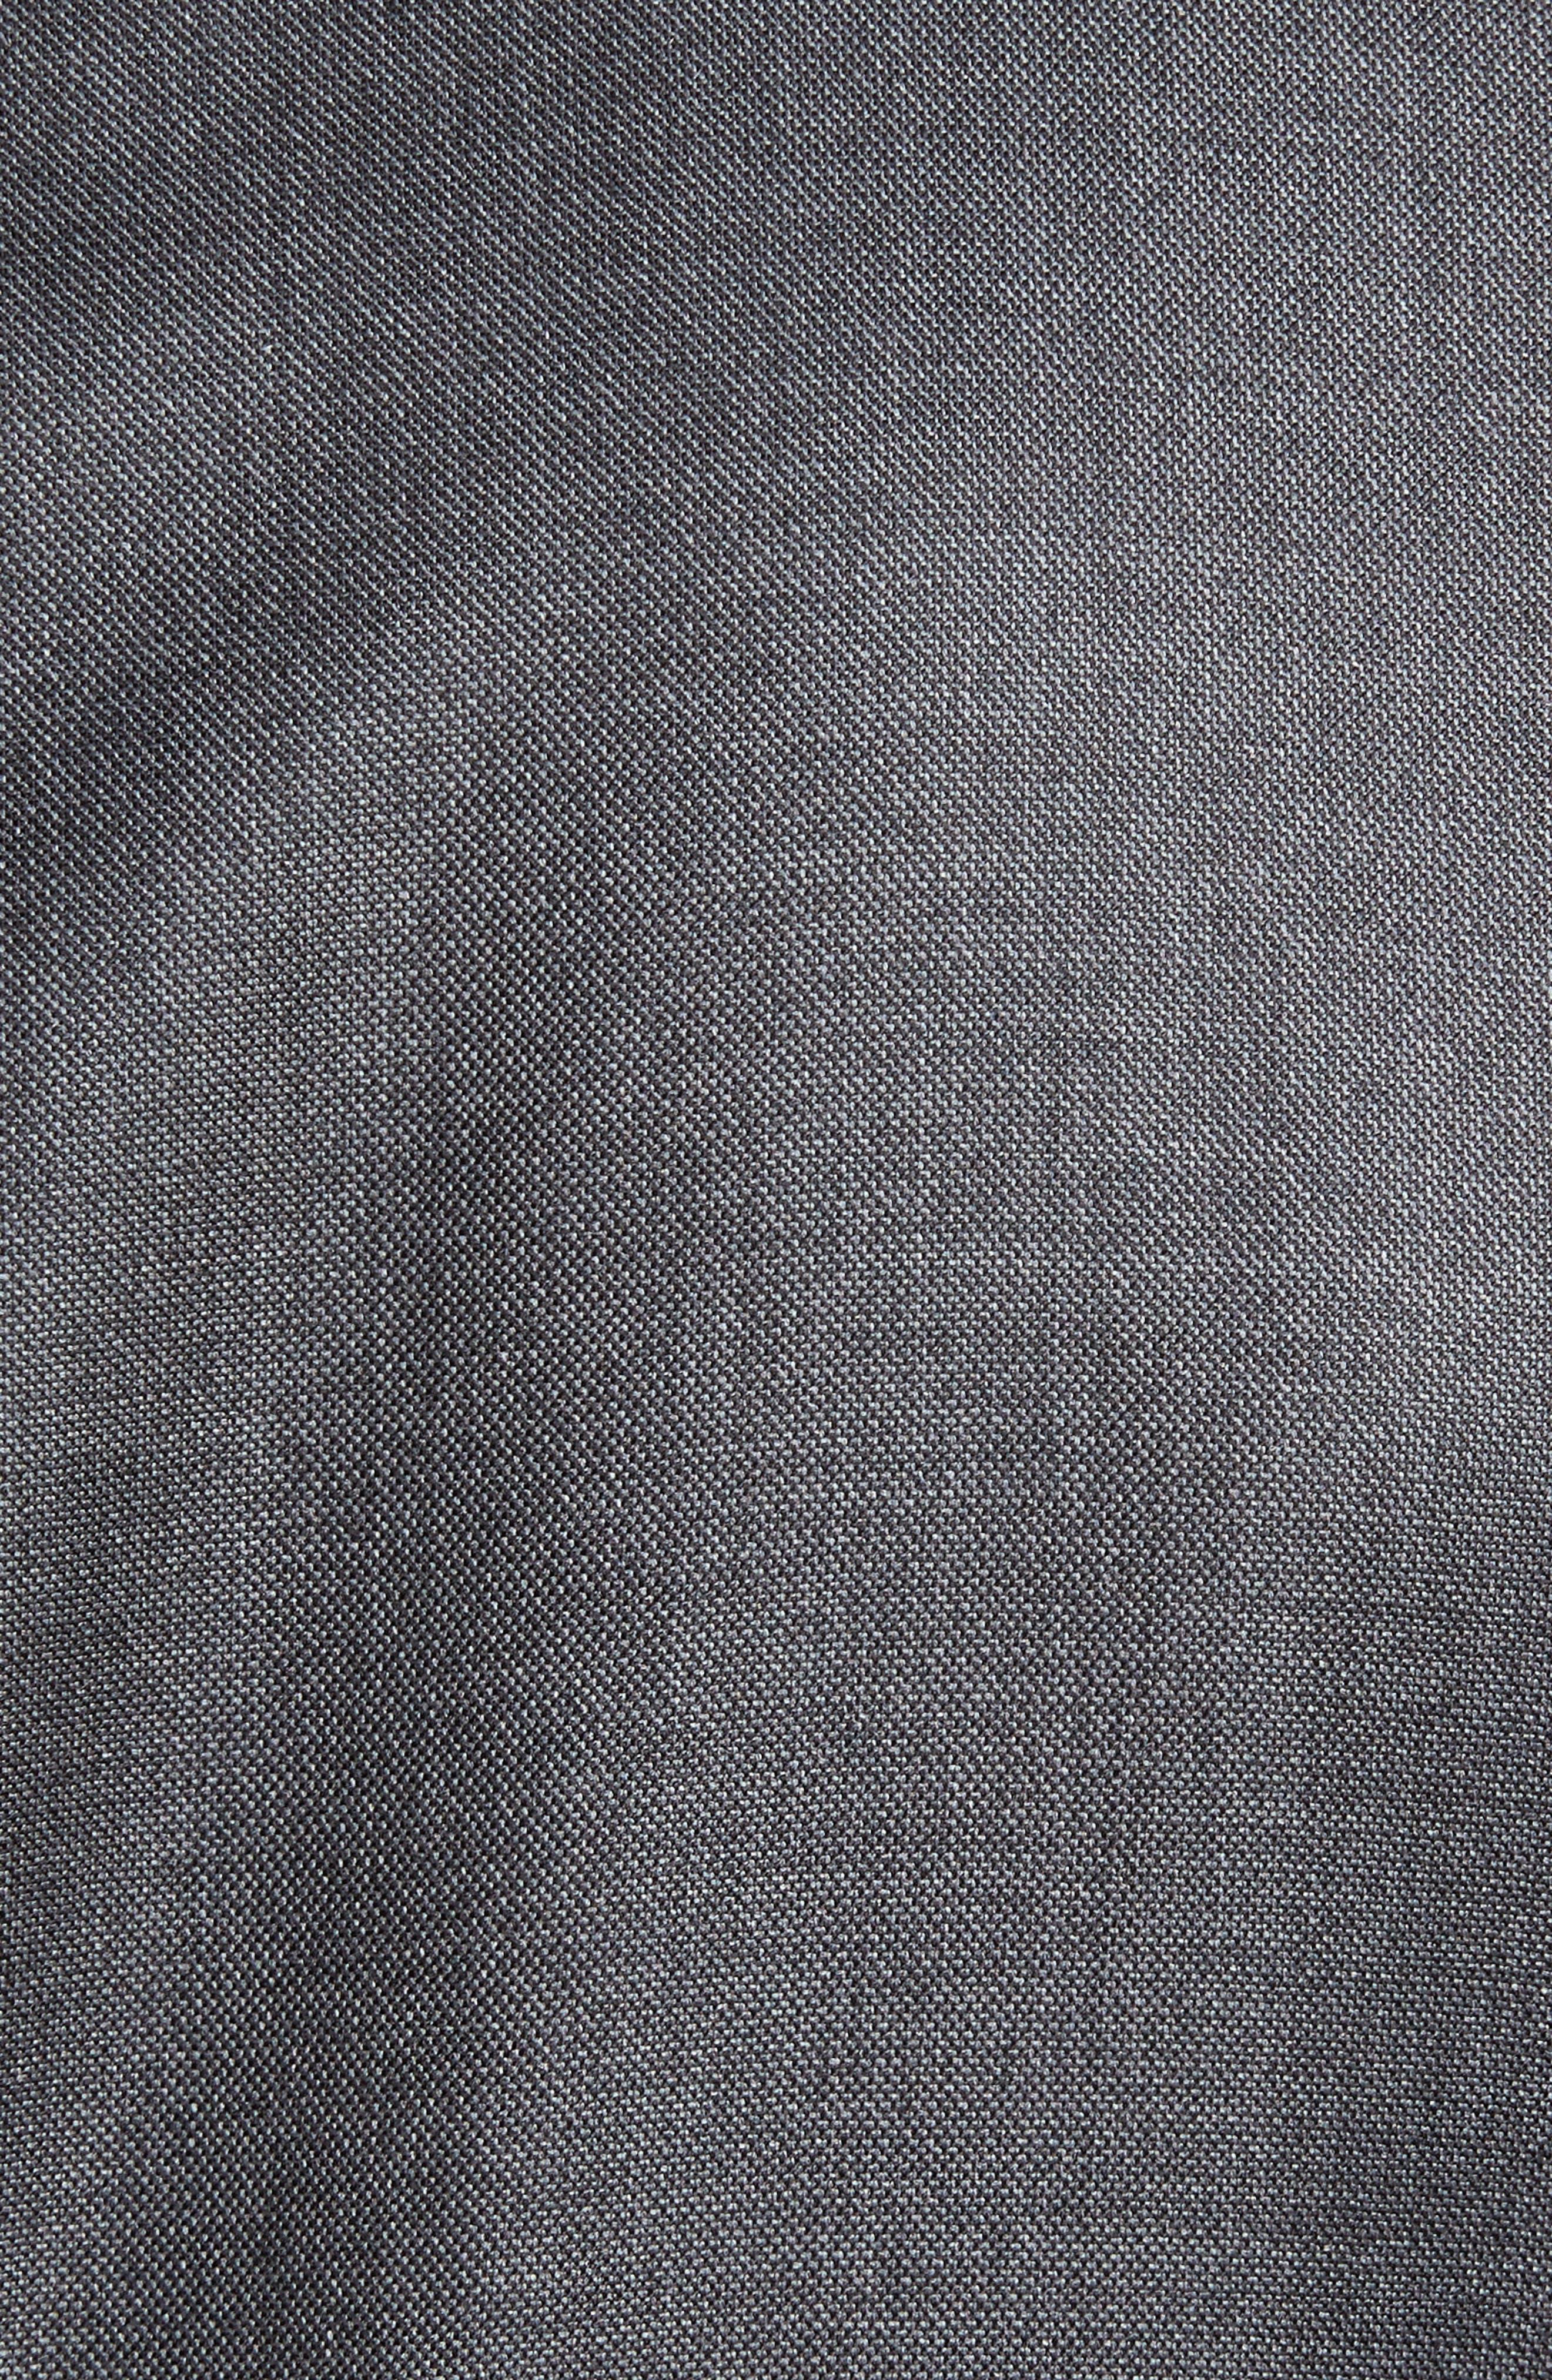 SAMUELSOHN,                             Beckett Classic Fit Sharkskin Wool Suit,                             Alternate thumbnail 7, color,                             020